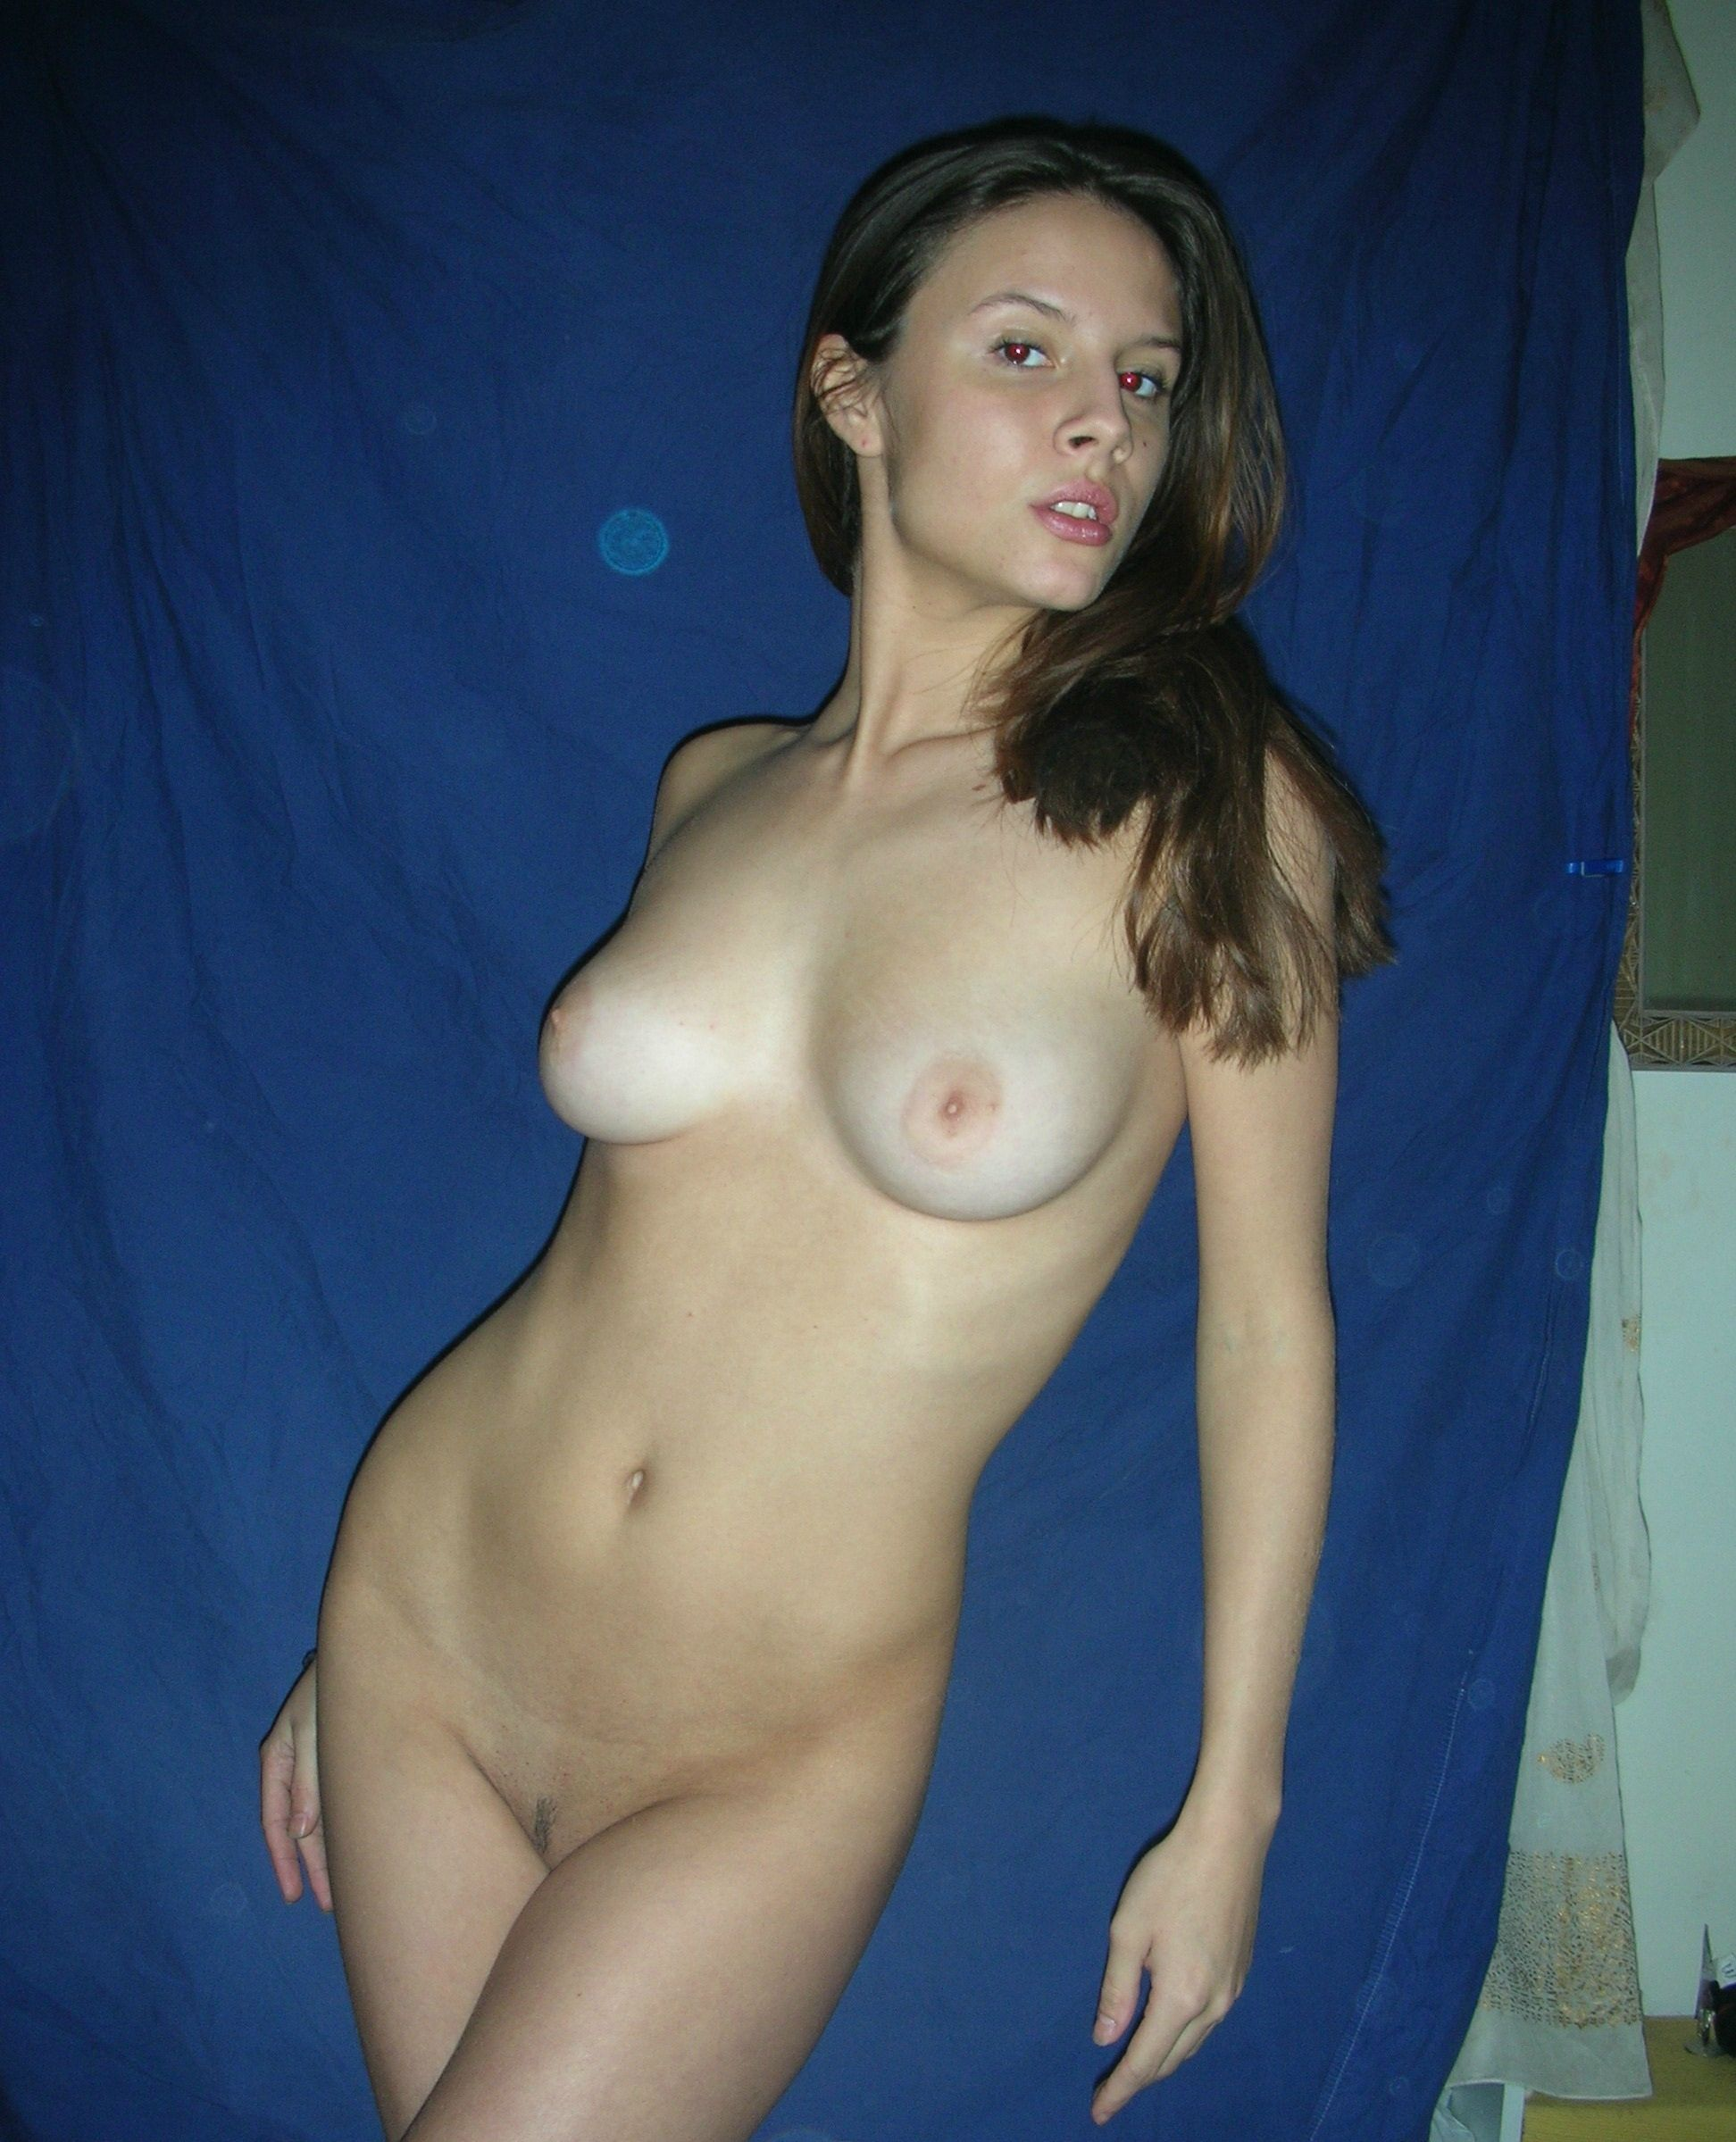 ex-girlfriend-nude-amateurs-girls-private-photo-mix-vol4-13